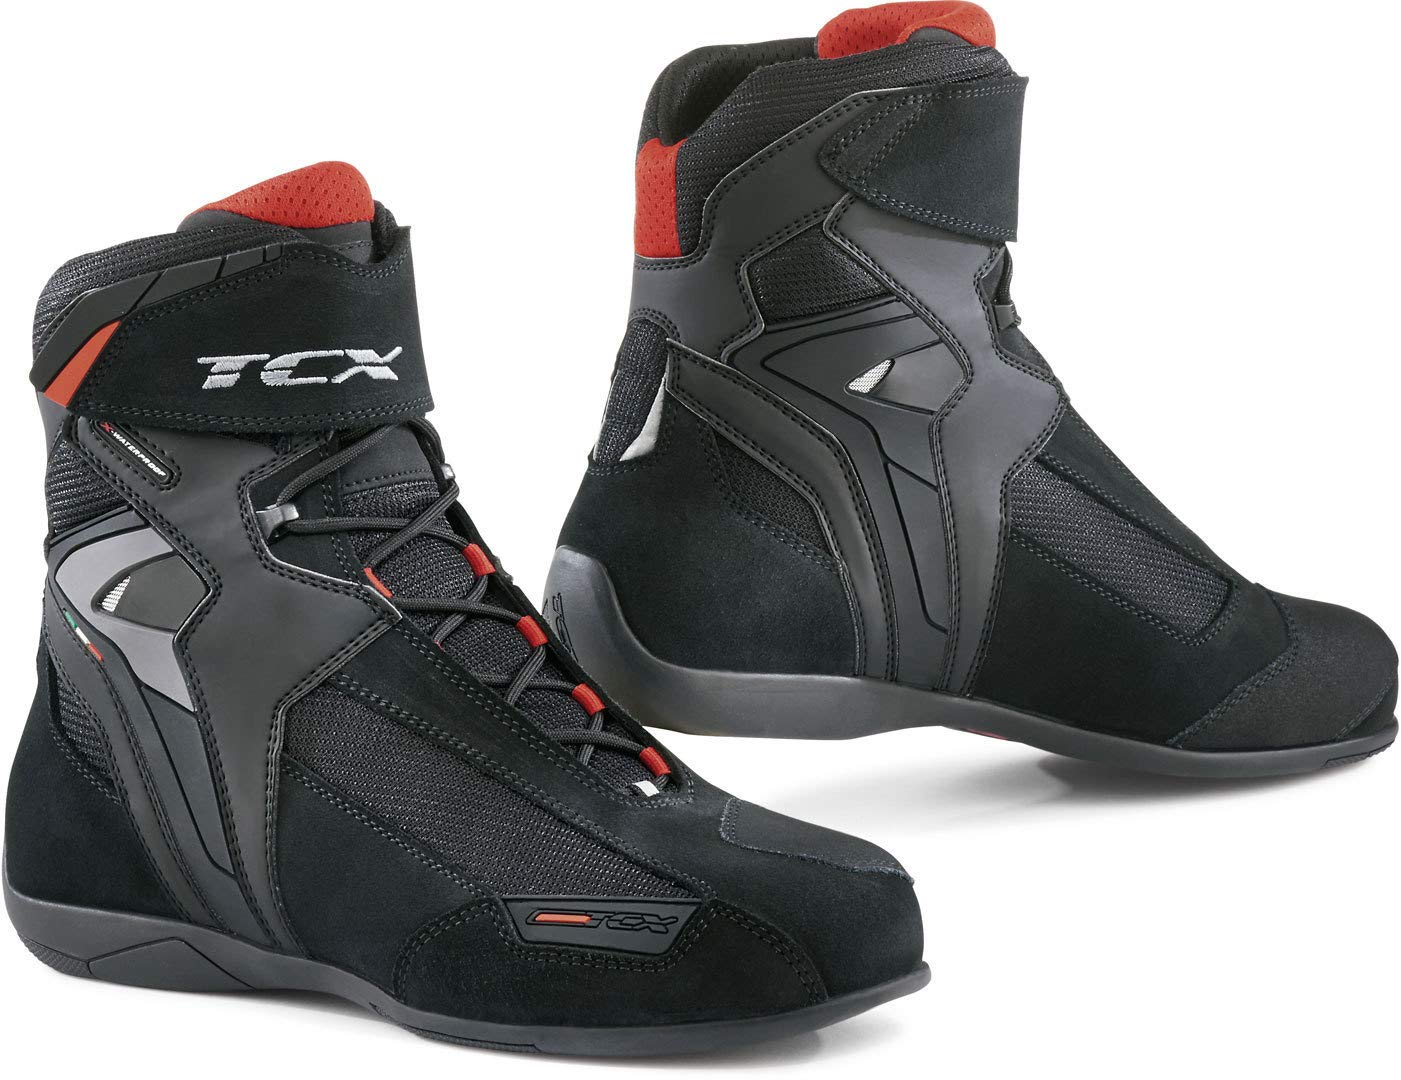 TCX Vibe WP Botas de Urban Cortos para Moto Bicicleta Impermeable/-/Negro